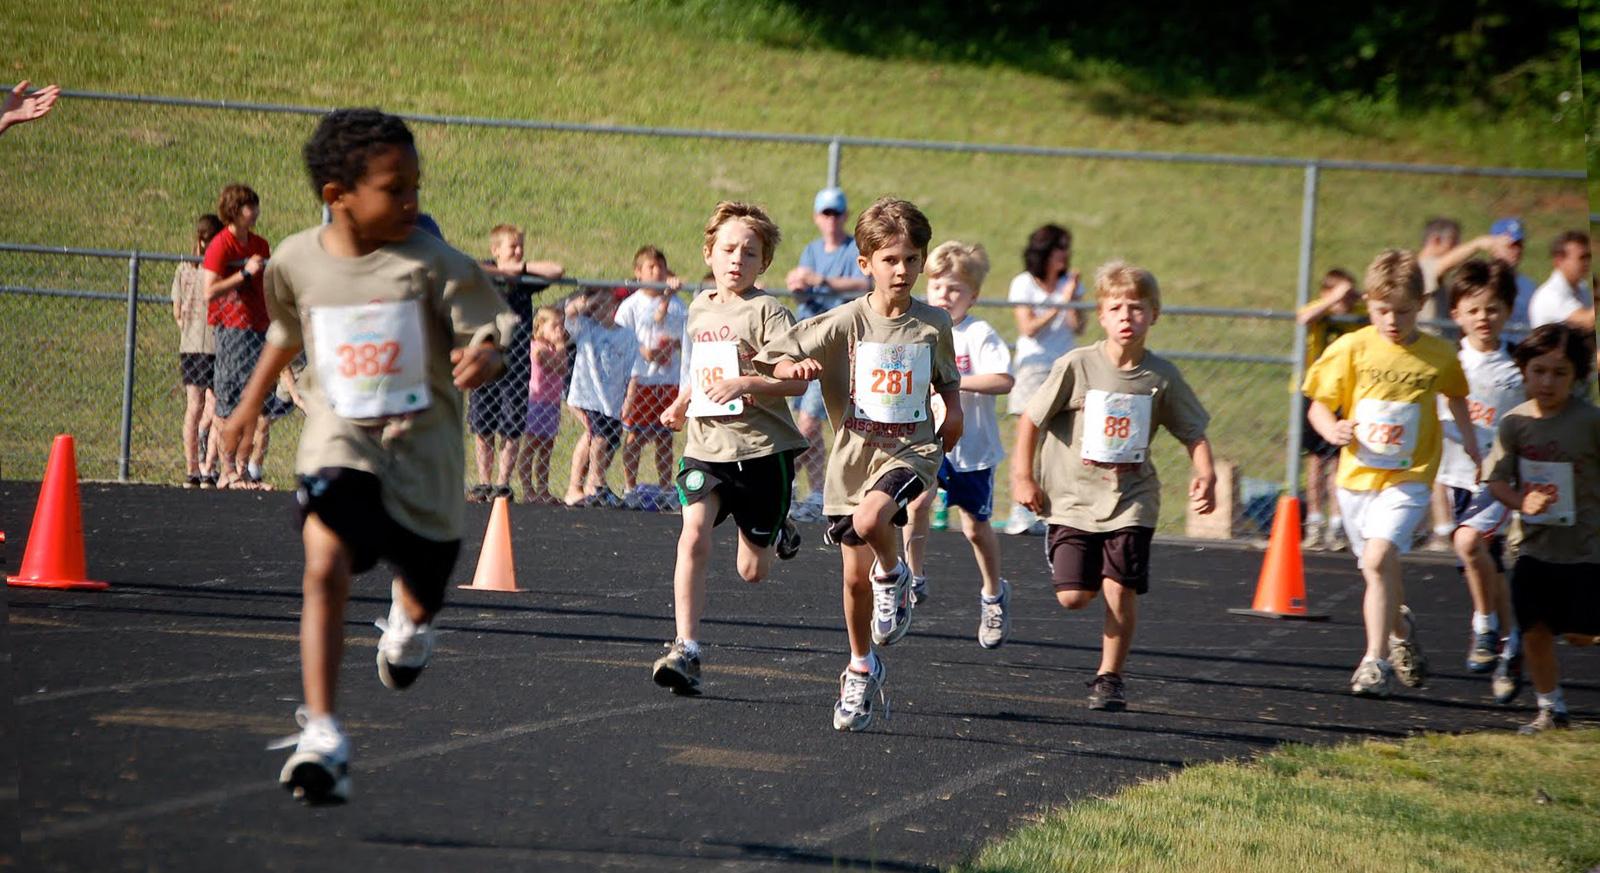 Corsa dei Peter Pan